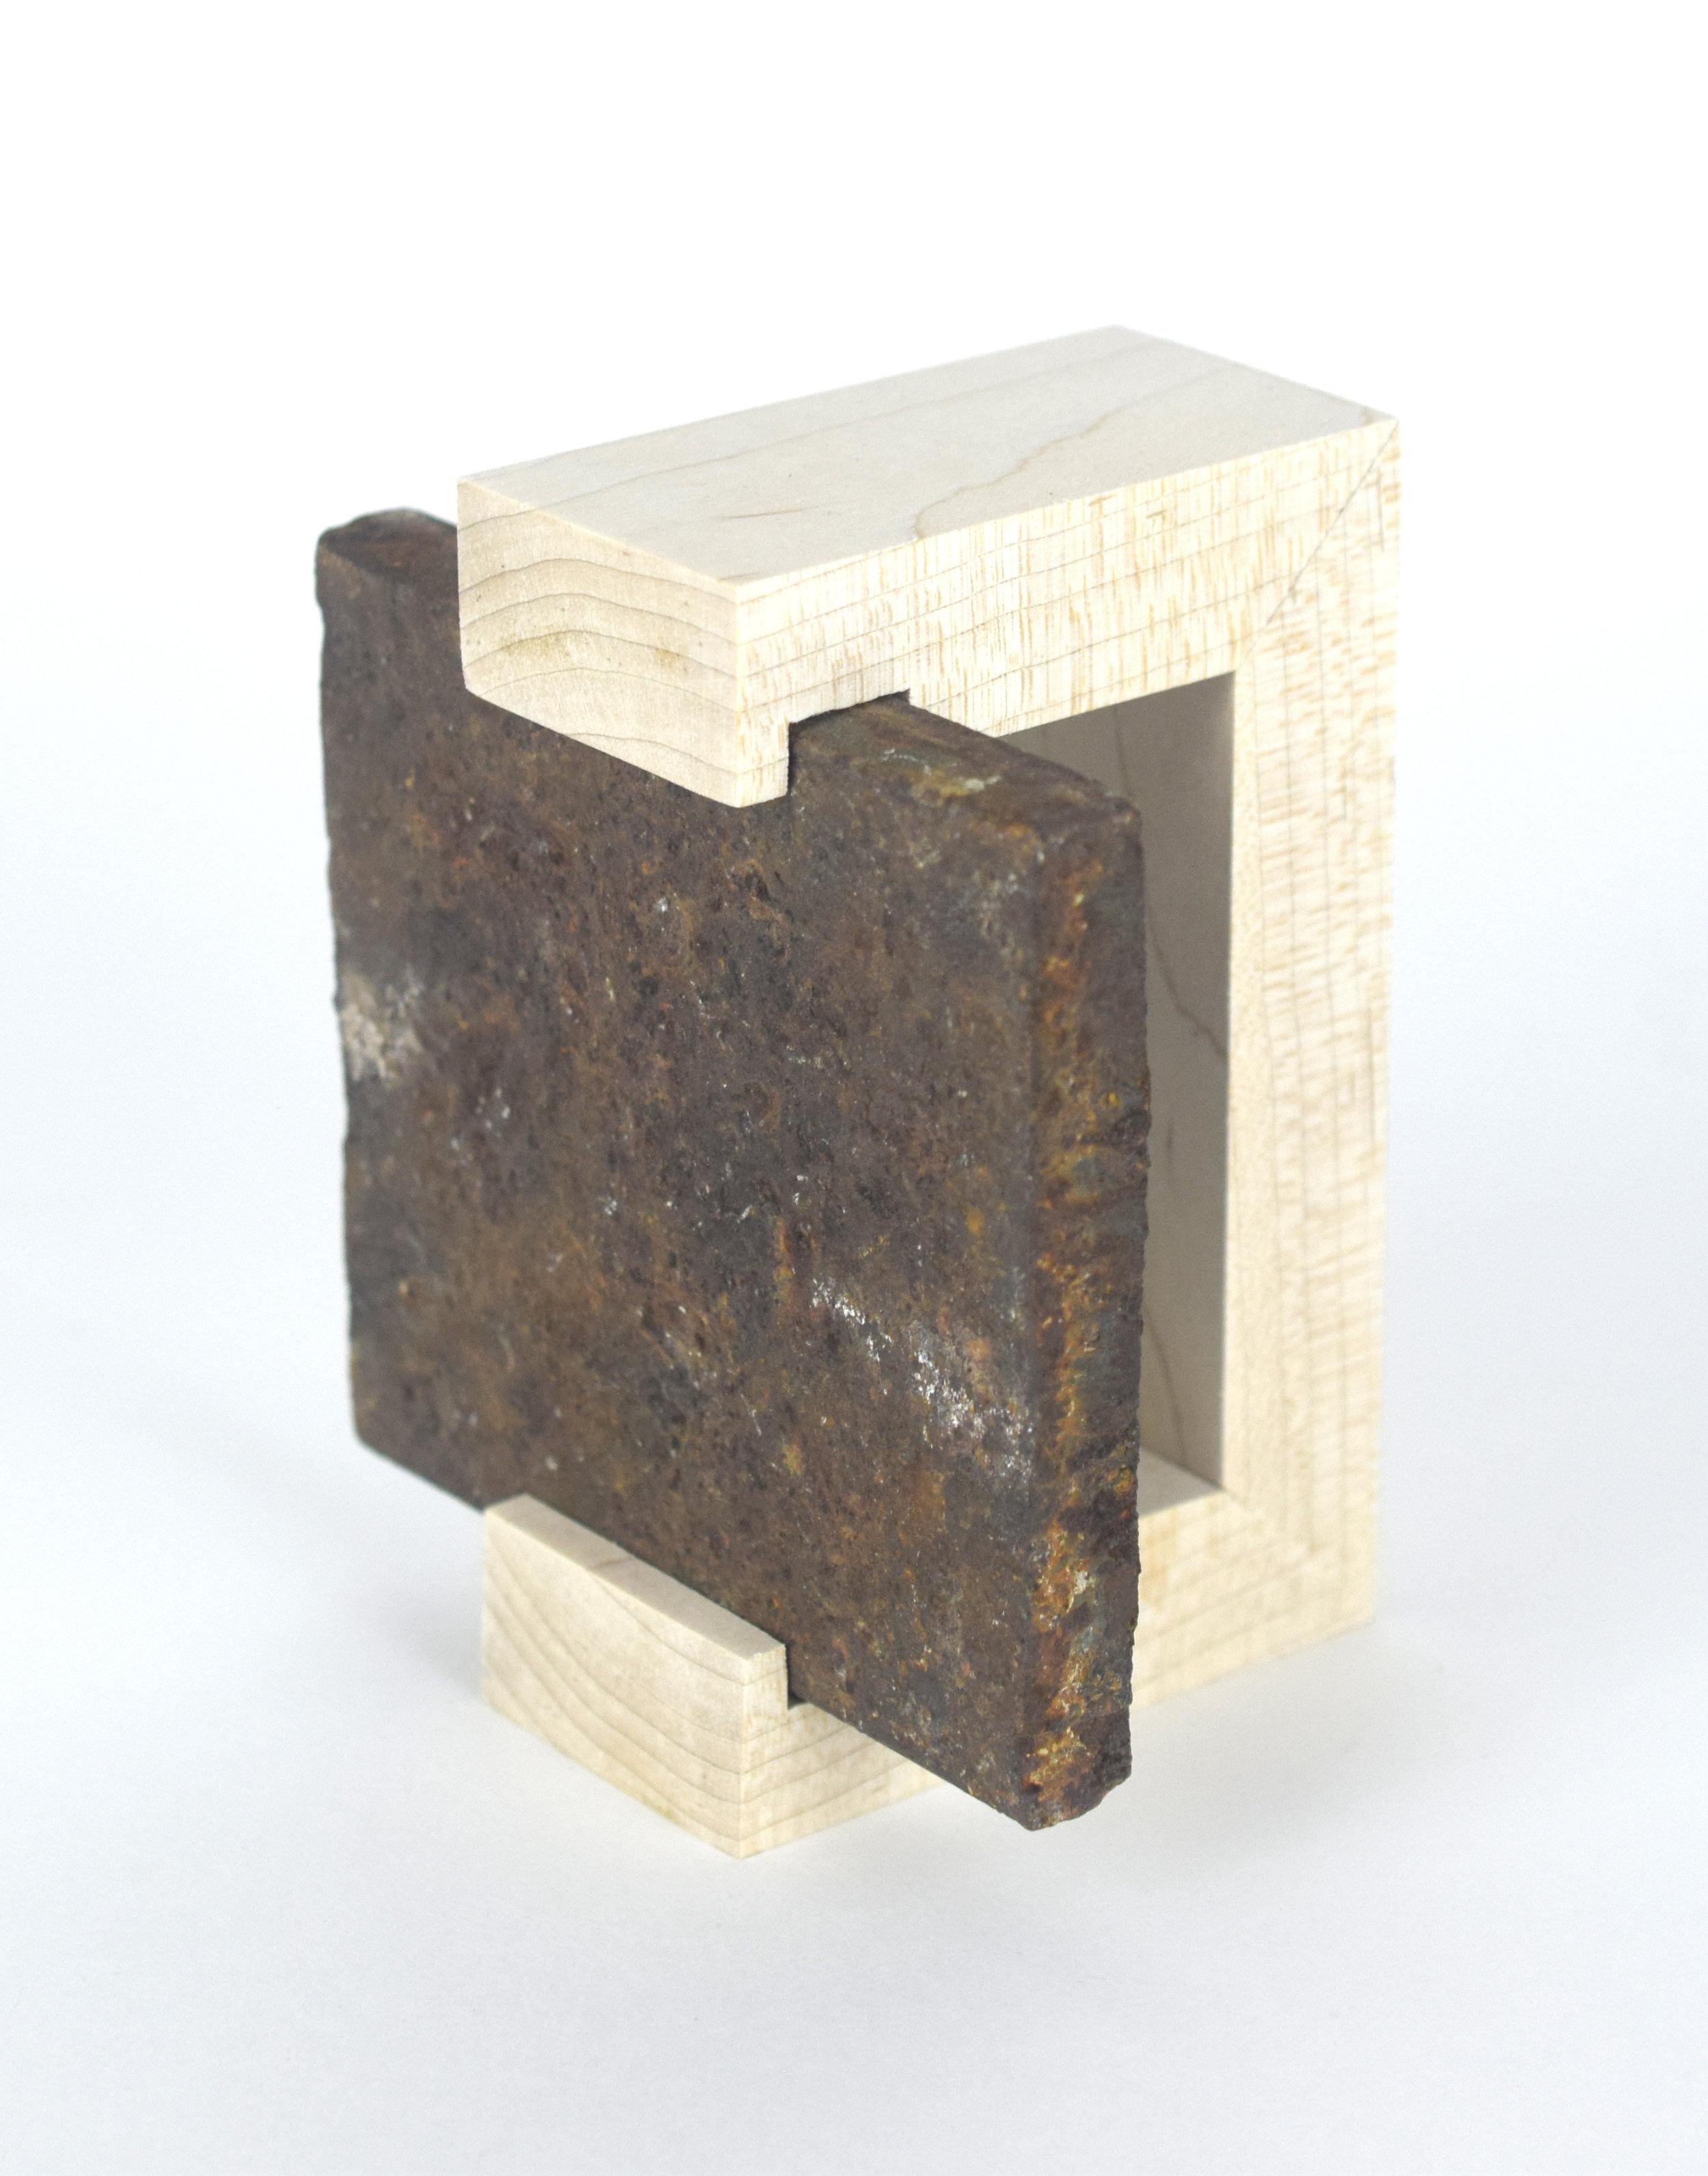 Plate, 4x5x3